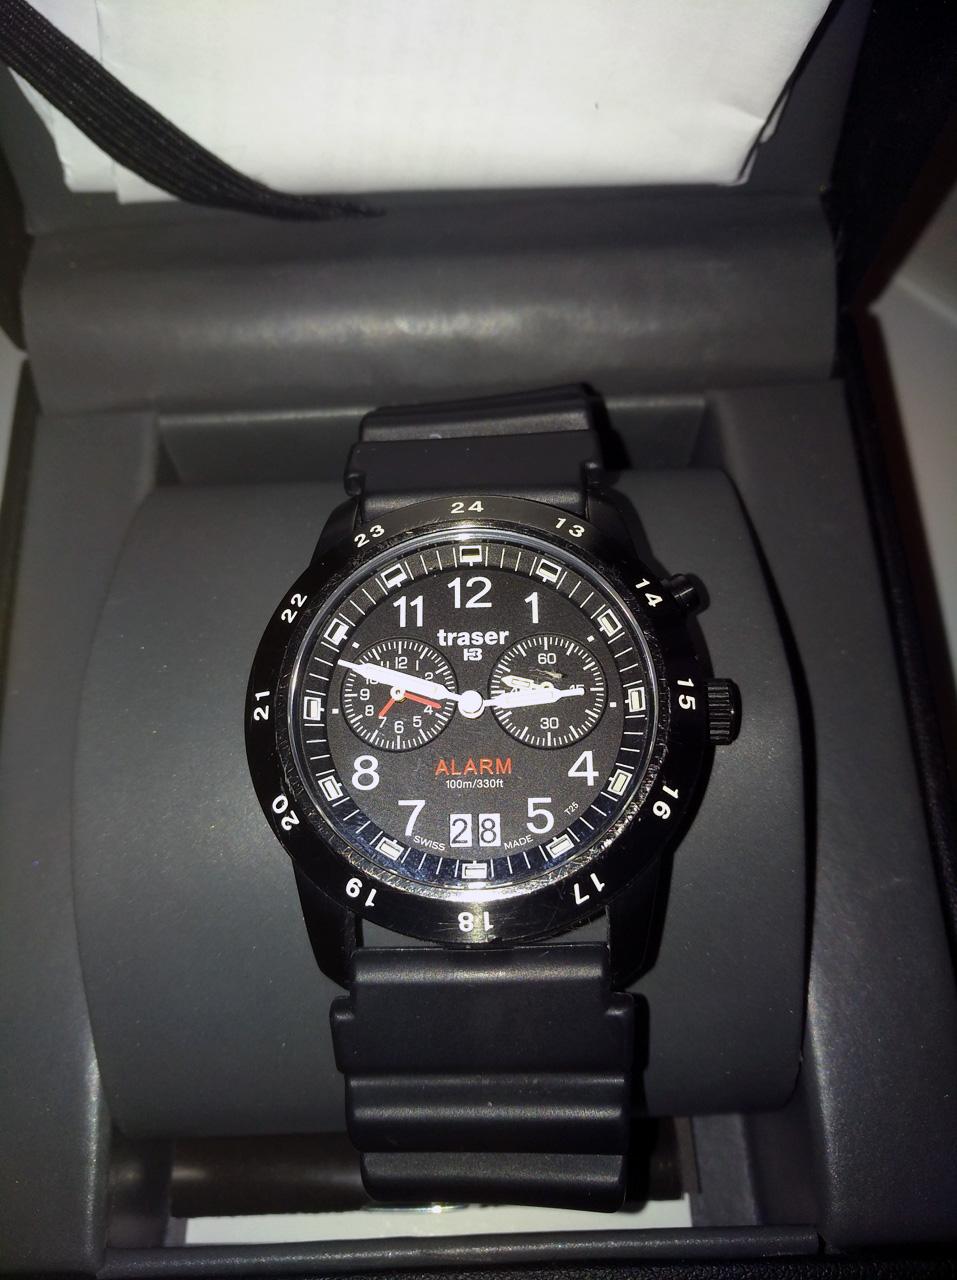 Prodam hodinky Traser Classic Alarm se safirovym sklickem 39a92a59f0